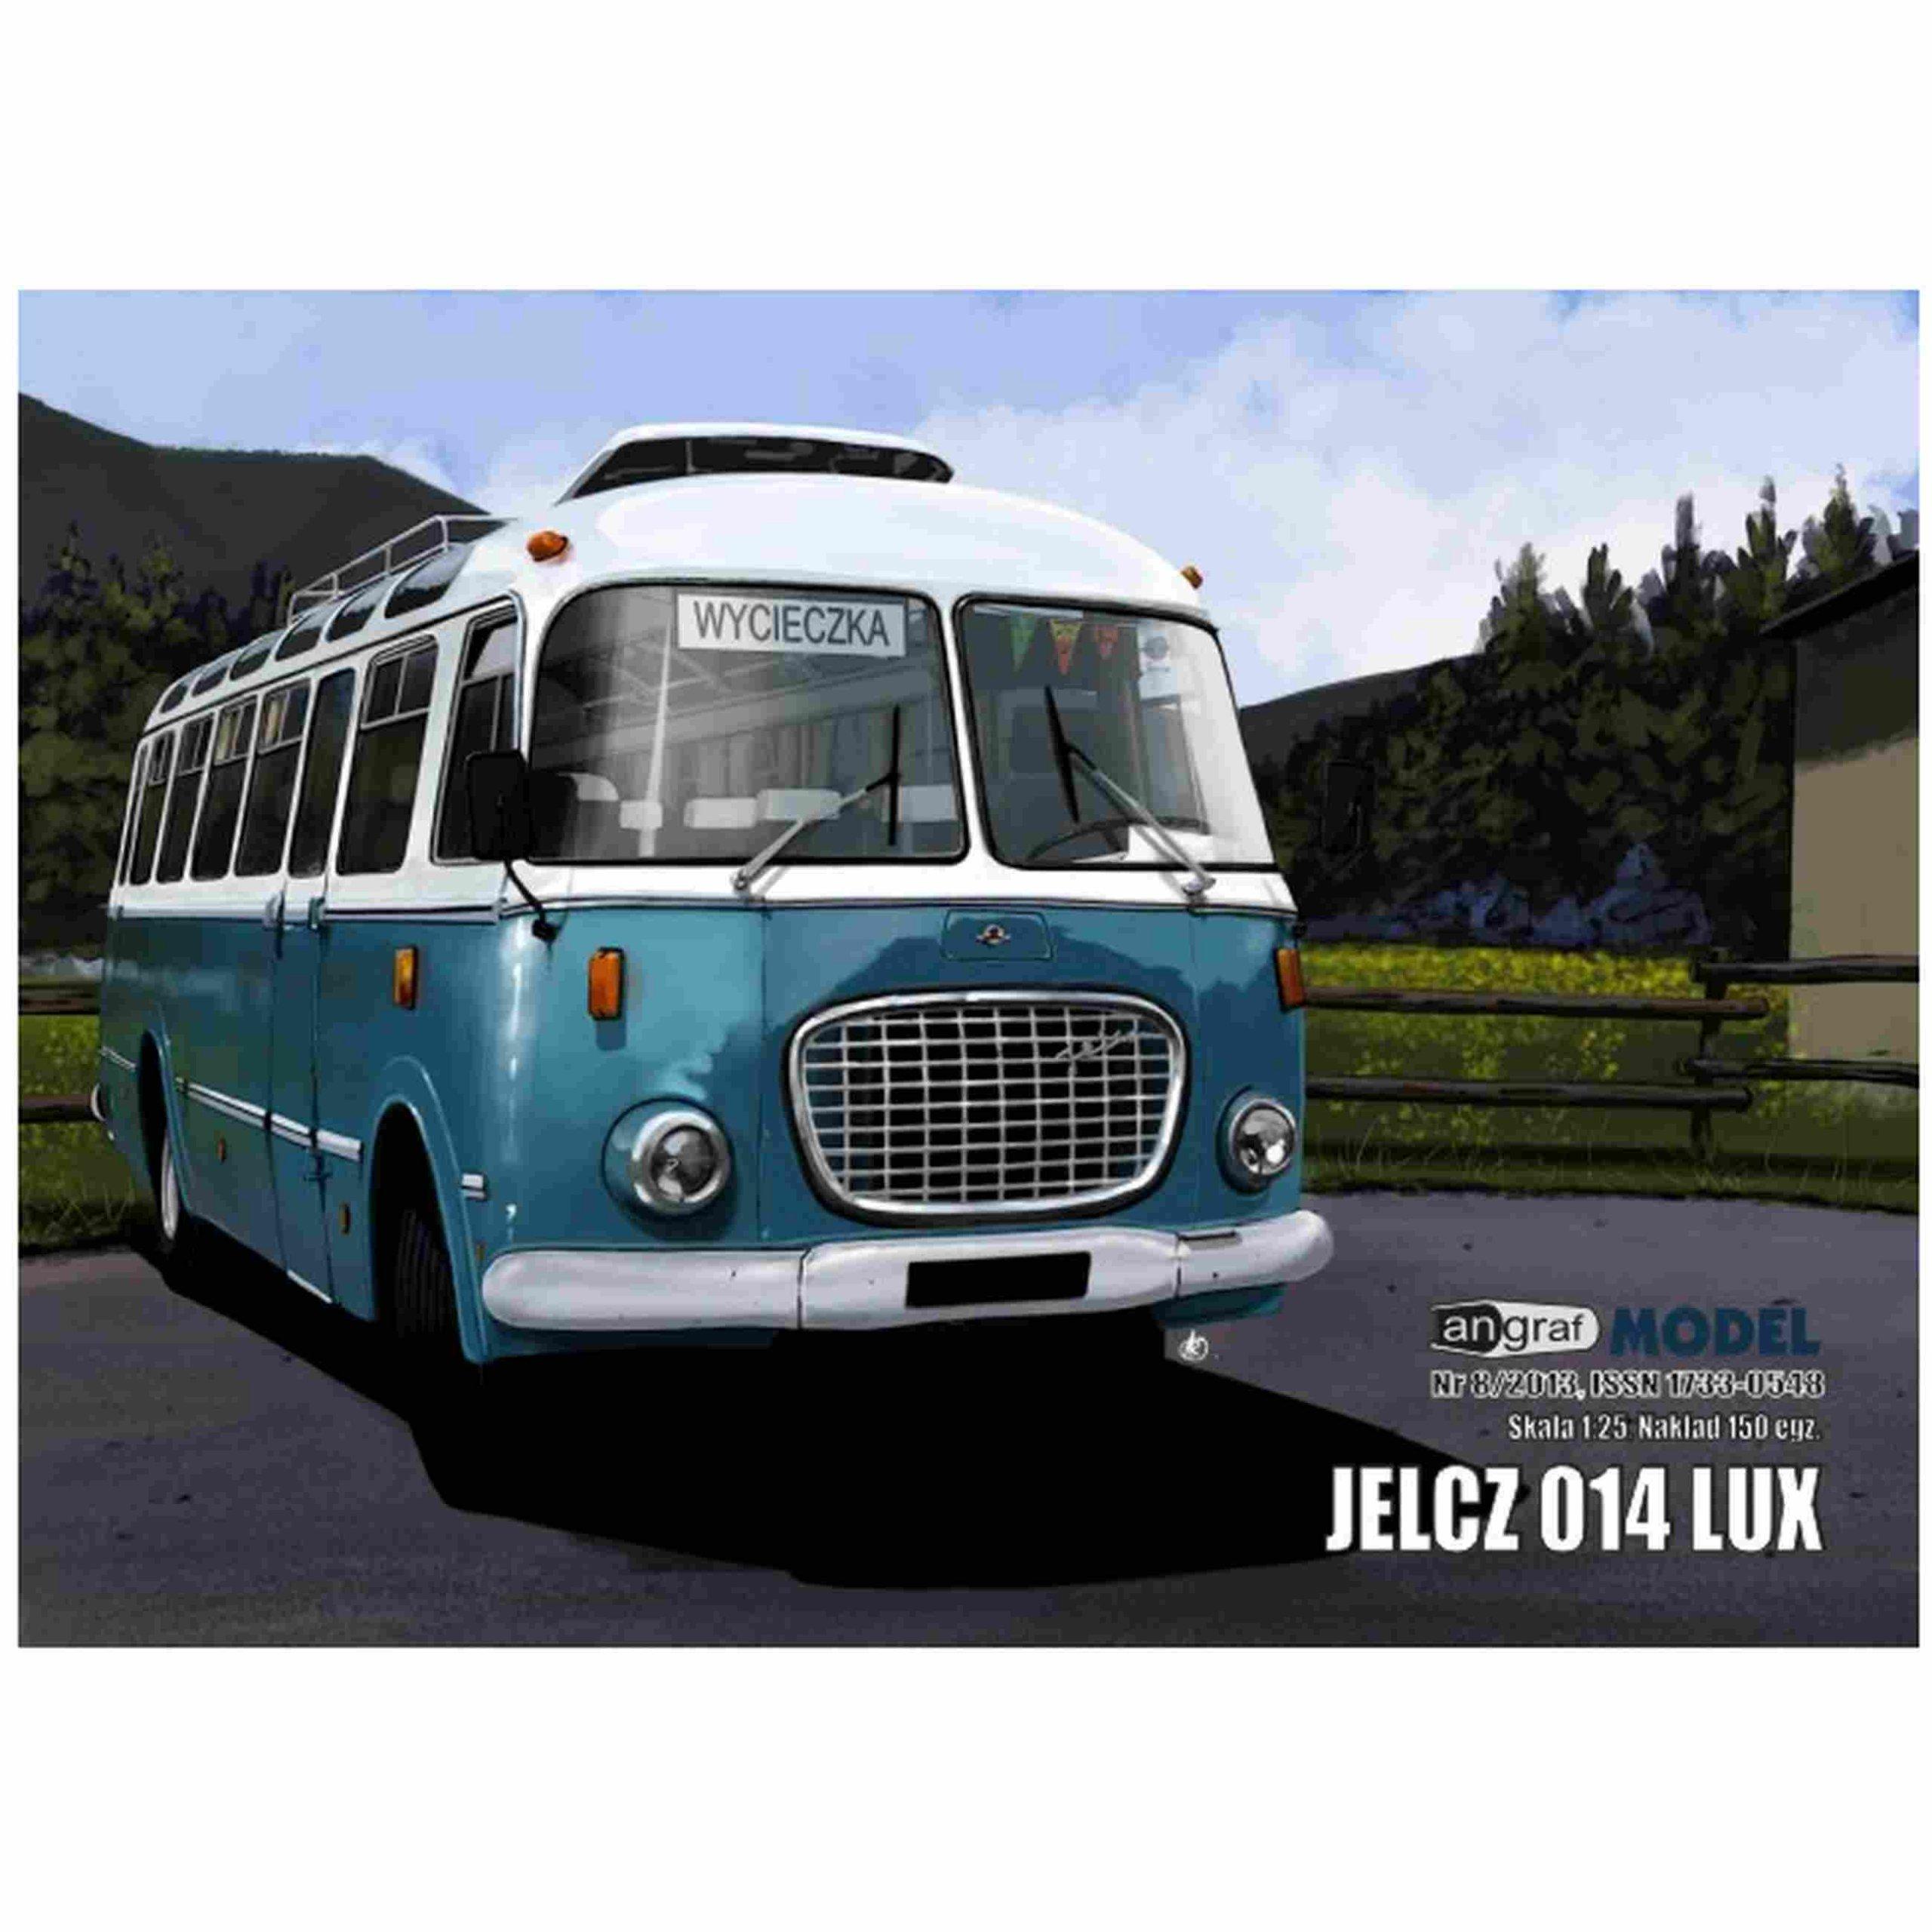 Angraf 8/16 - Bus Jelcz 014 LUX 1:25